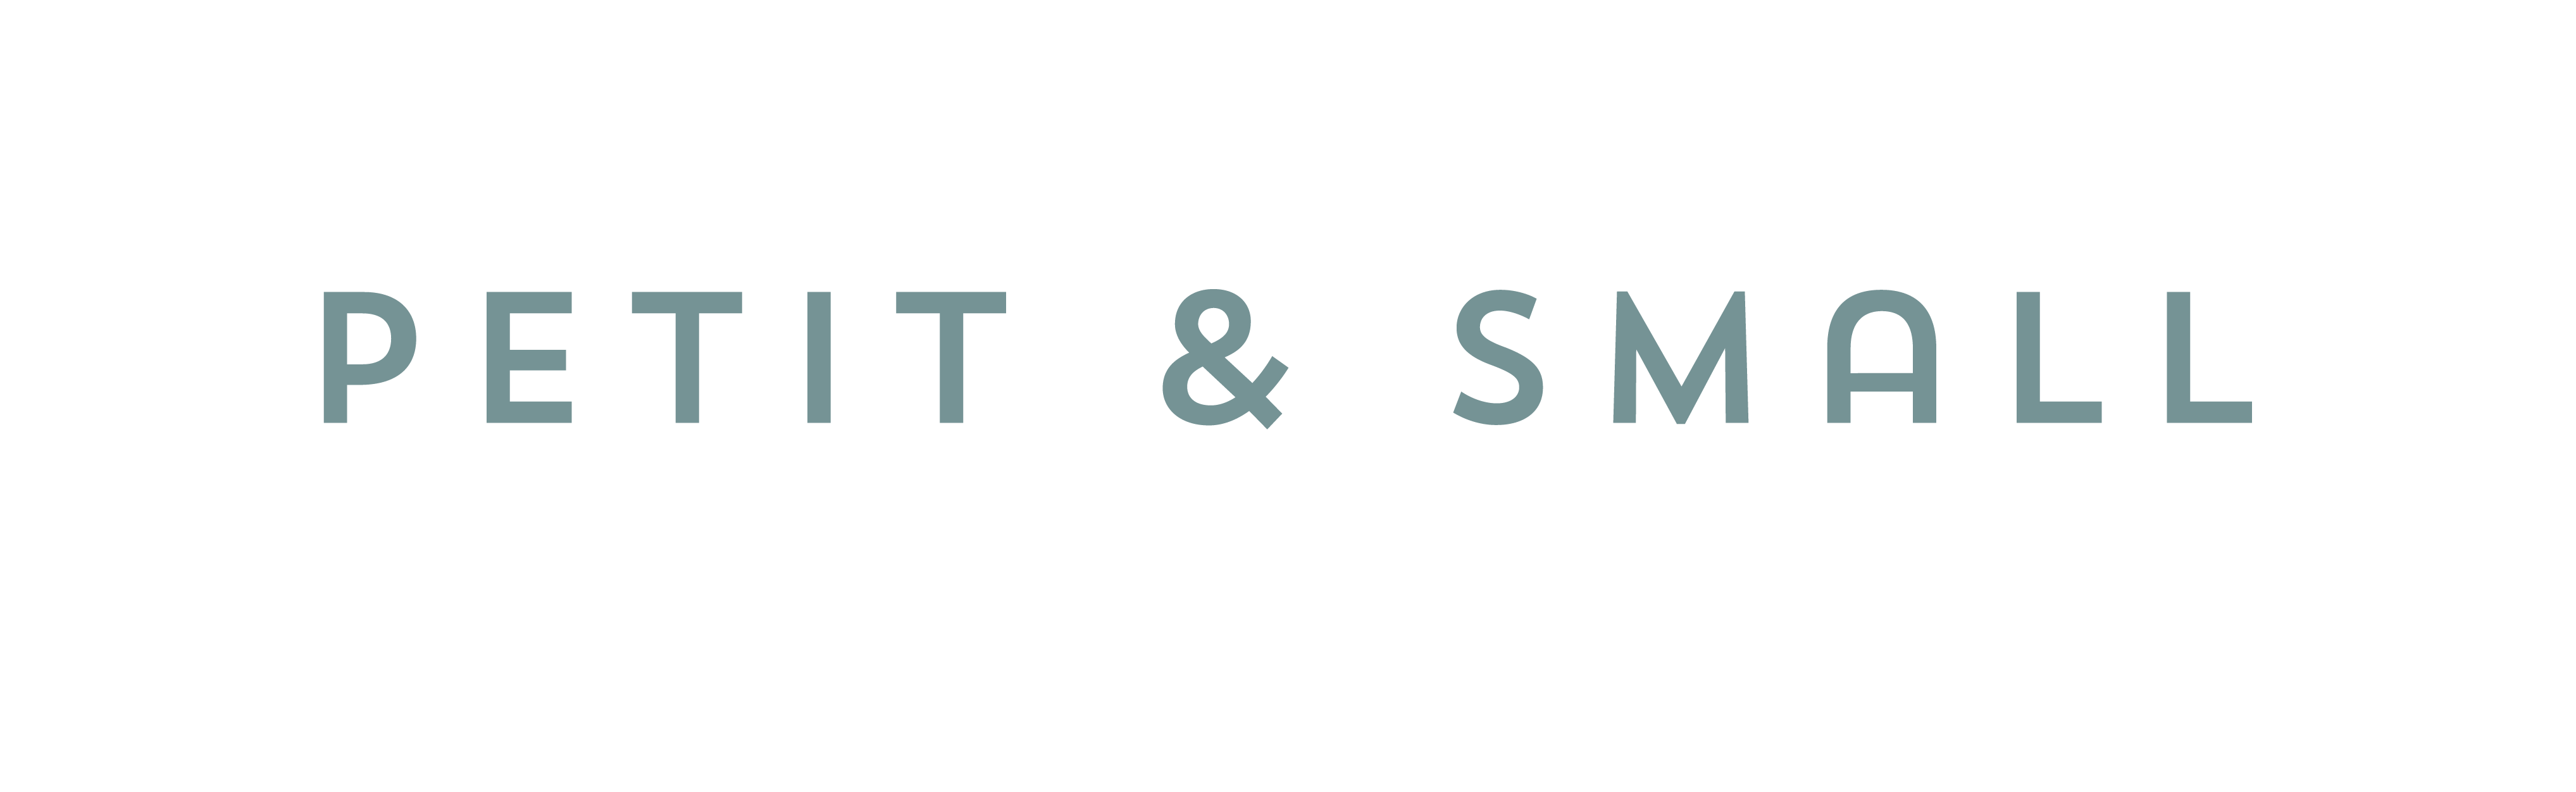 Petit & Small